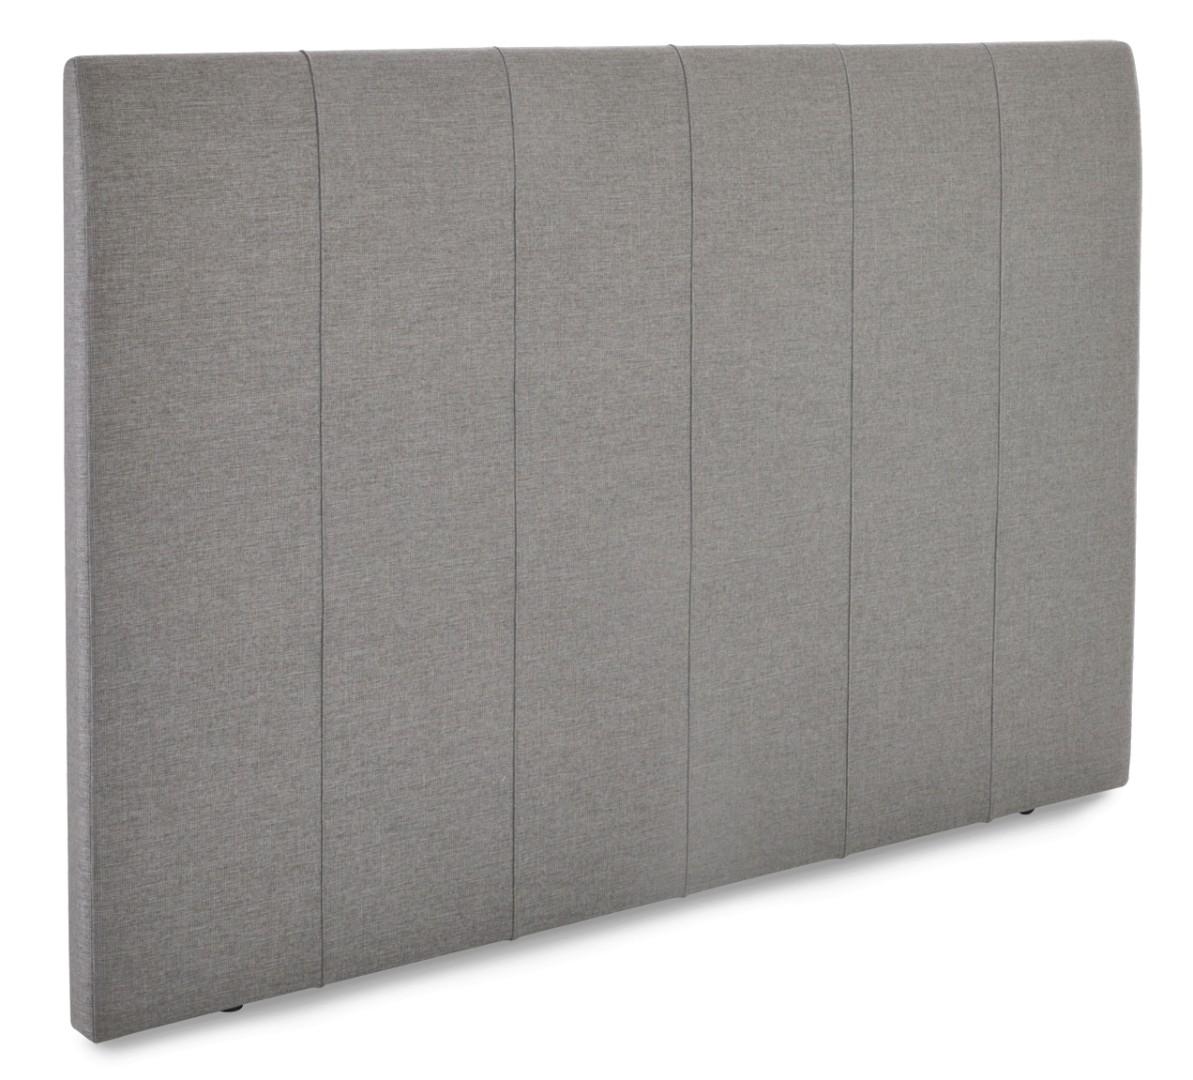 Asko Bonnell CLASSIC-sängynpääty 160 cm